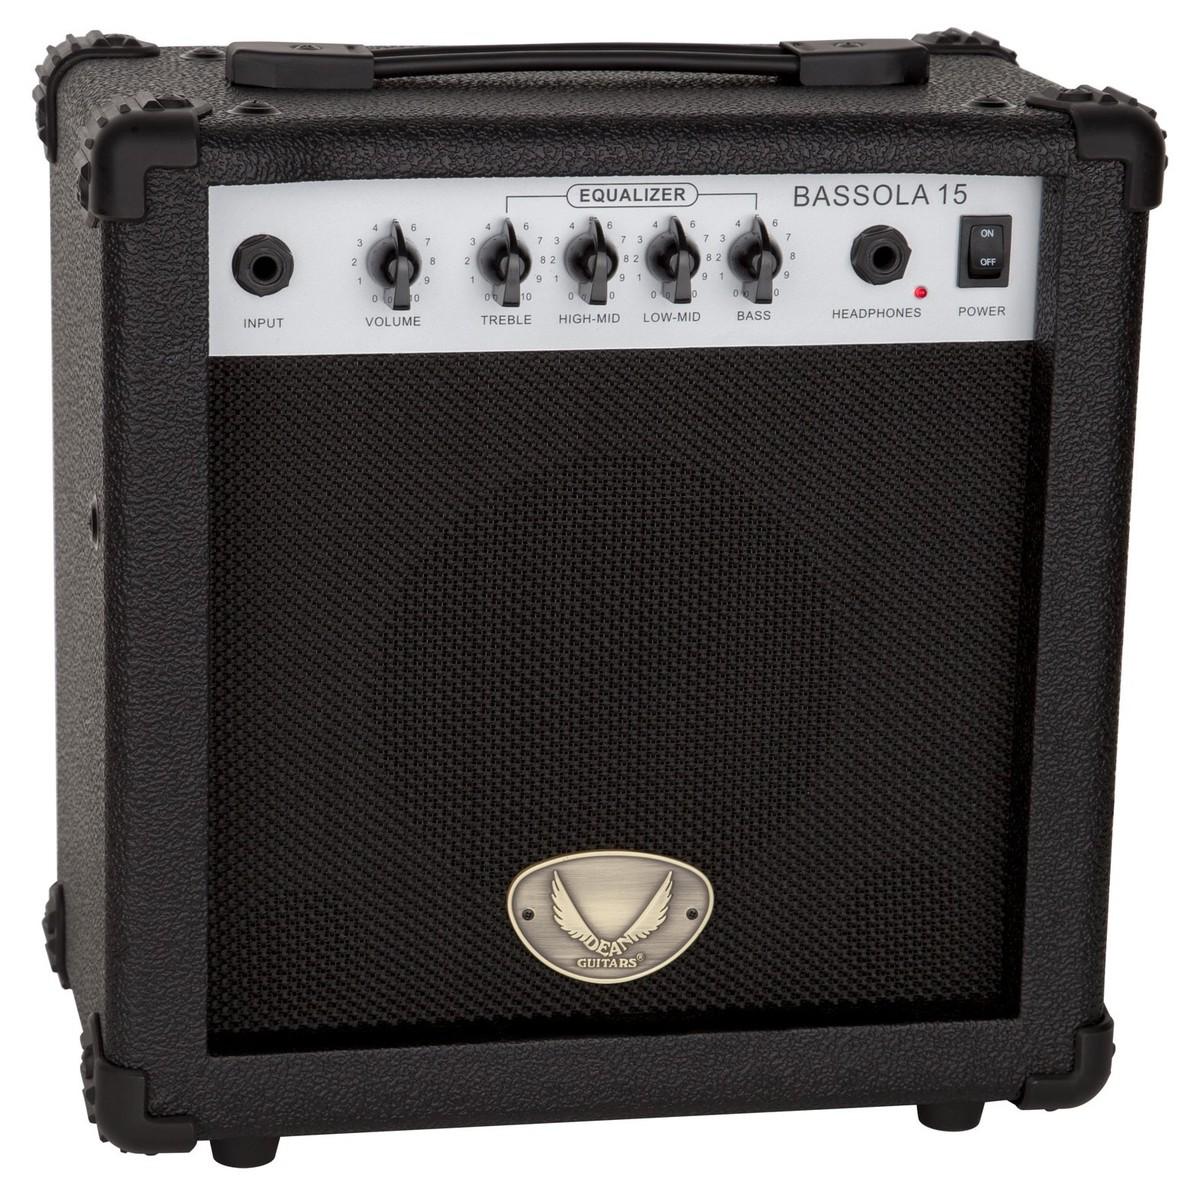 dean bassola 15 bass amp 15 watts at. Black Bedroom Furniture Sets. Home Design Ideas